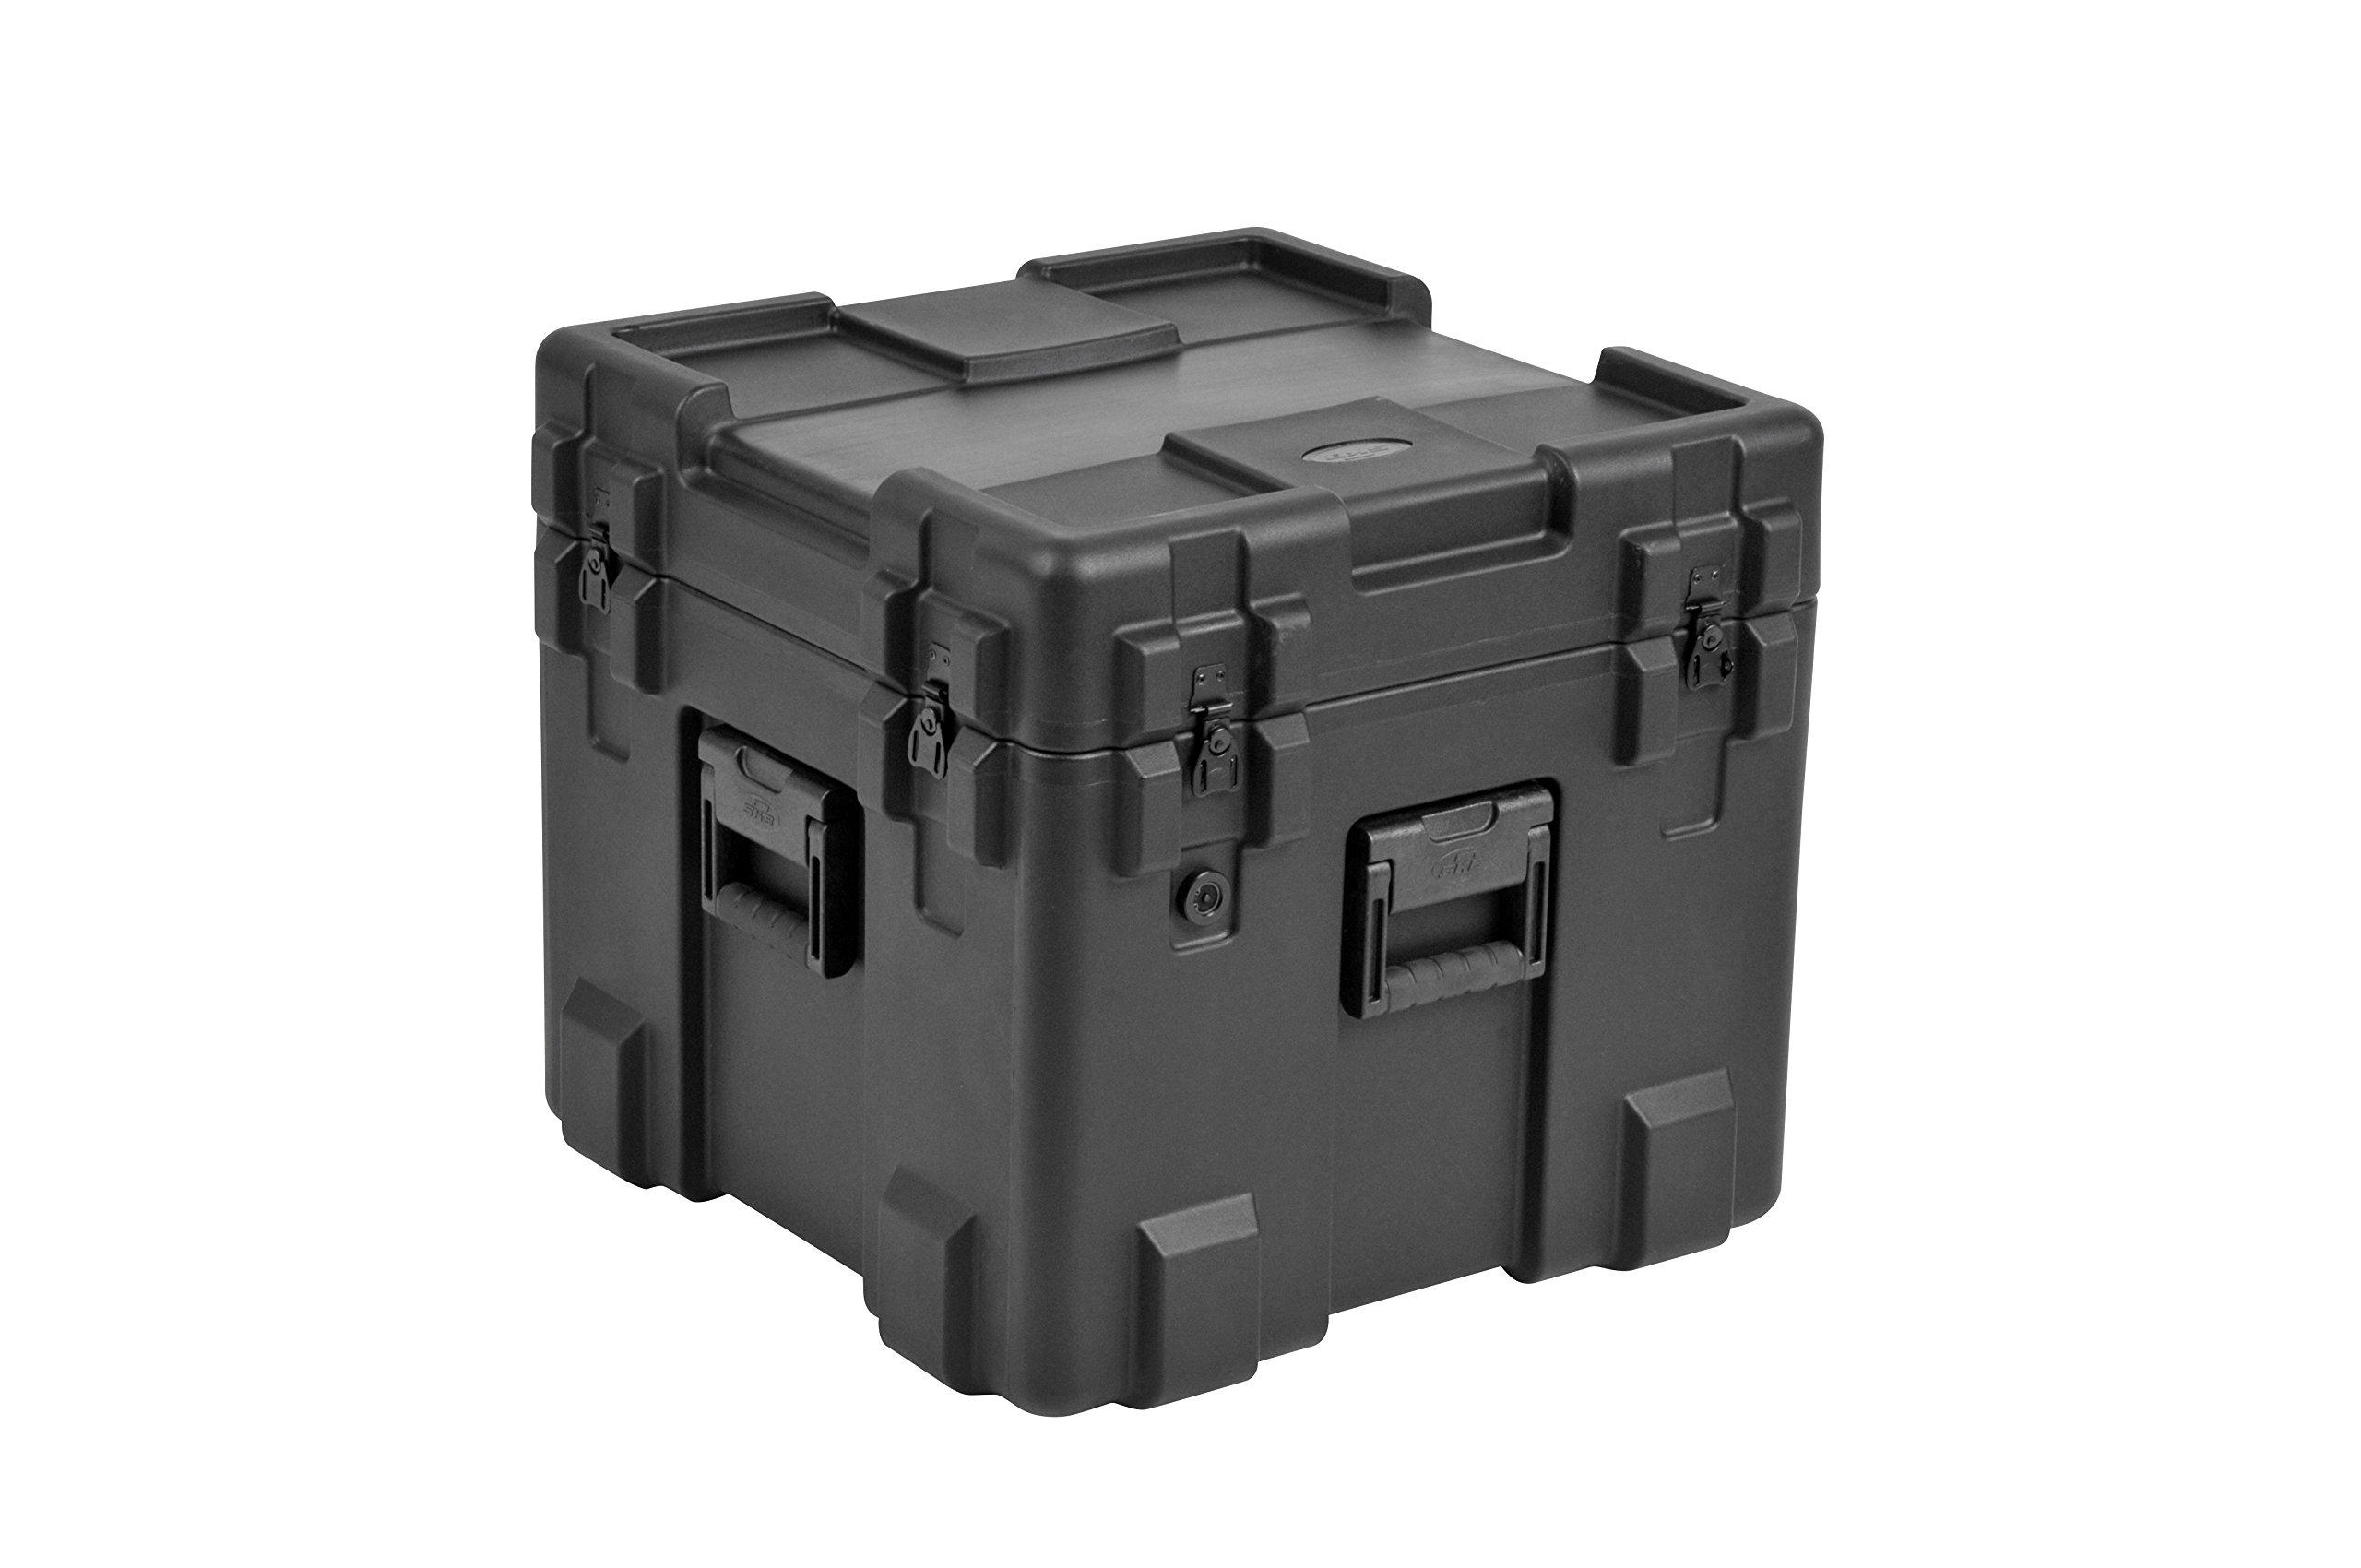 SKB Equipment Case, 22 X 22 X 20, Cubed Foam, Caster Kit Sold Separately